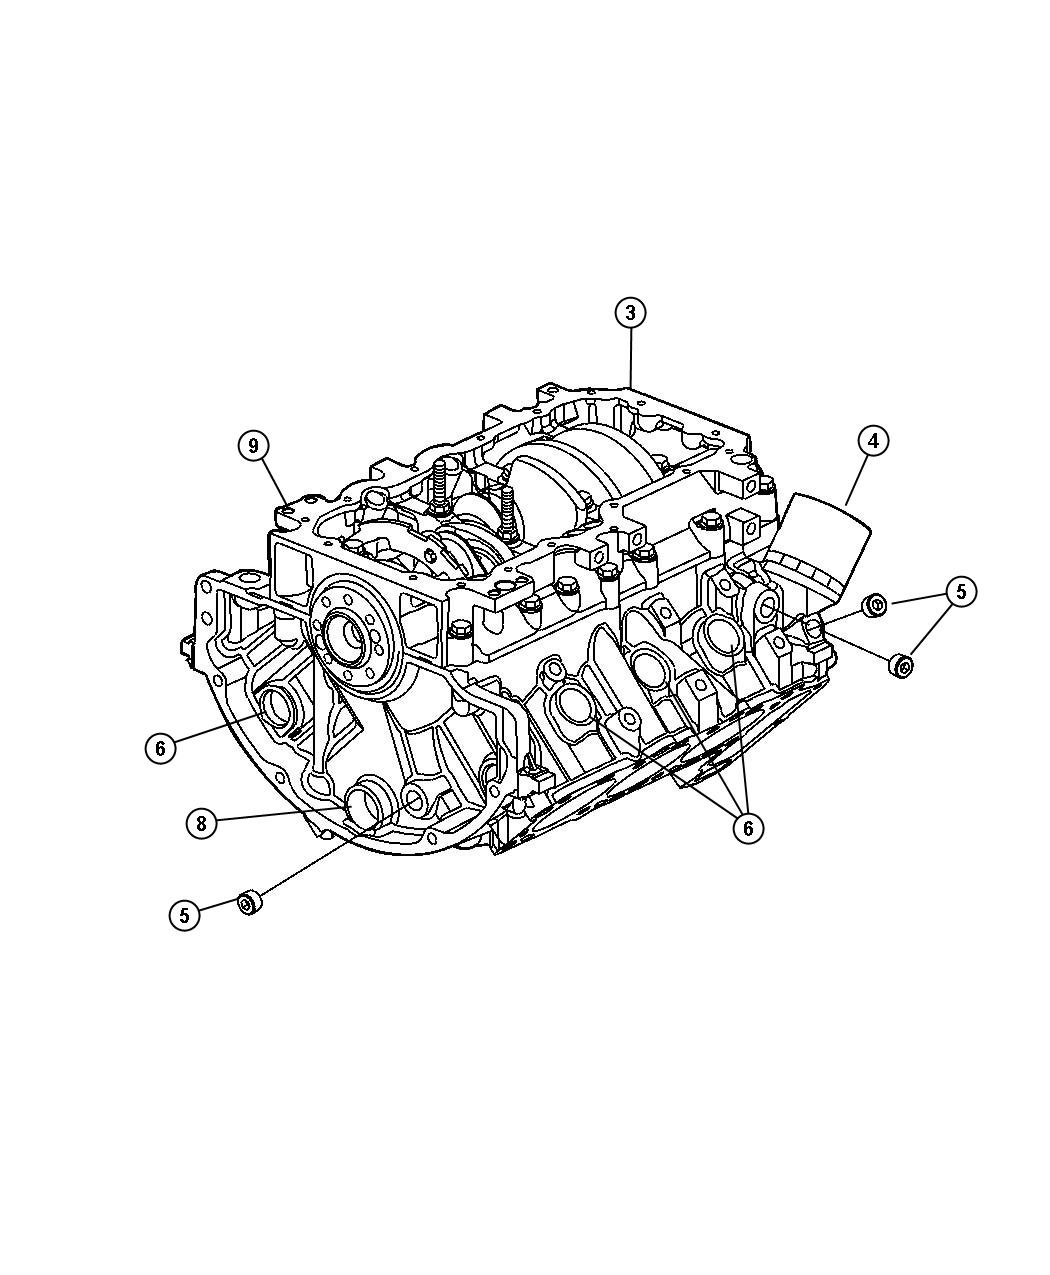 2001 Dodge Durango Gasket package. Engine lower. Notes